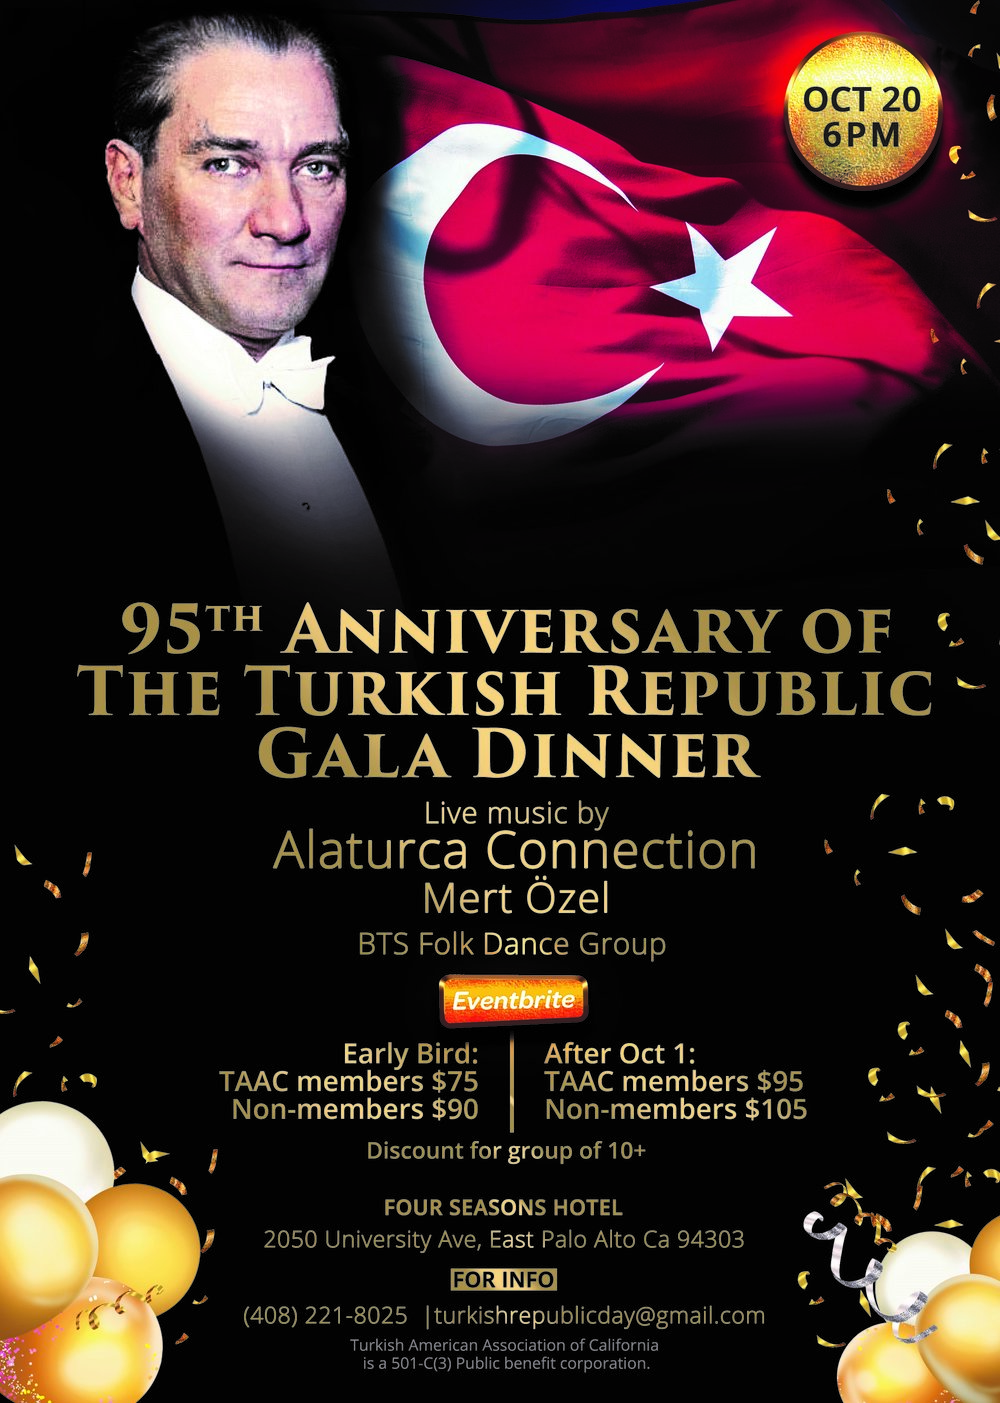 TRDDD Gala TAAC 102018 Poster.jpg